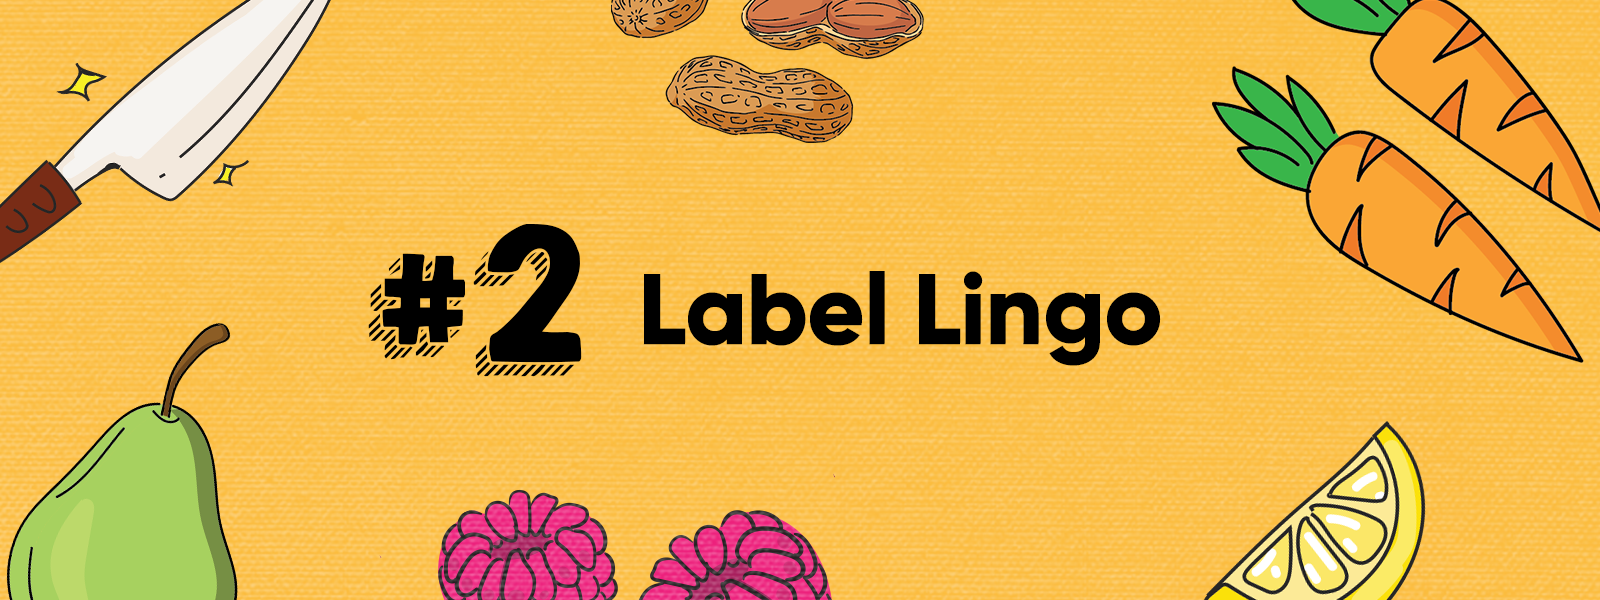 Skill 2: Label Lingo